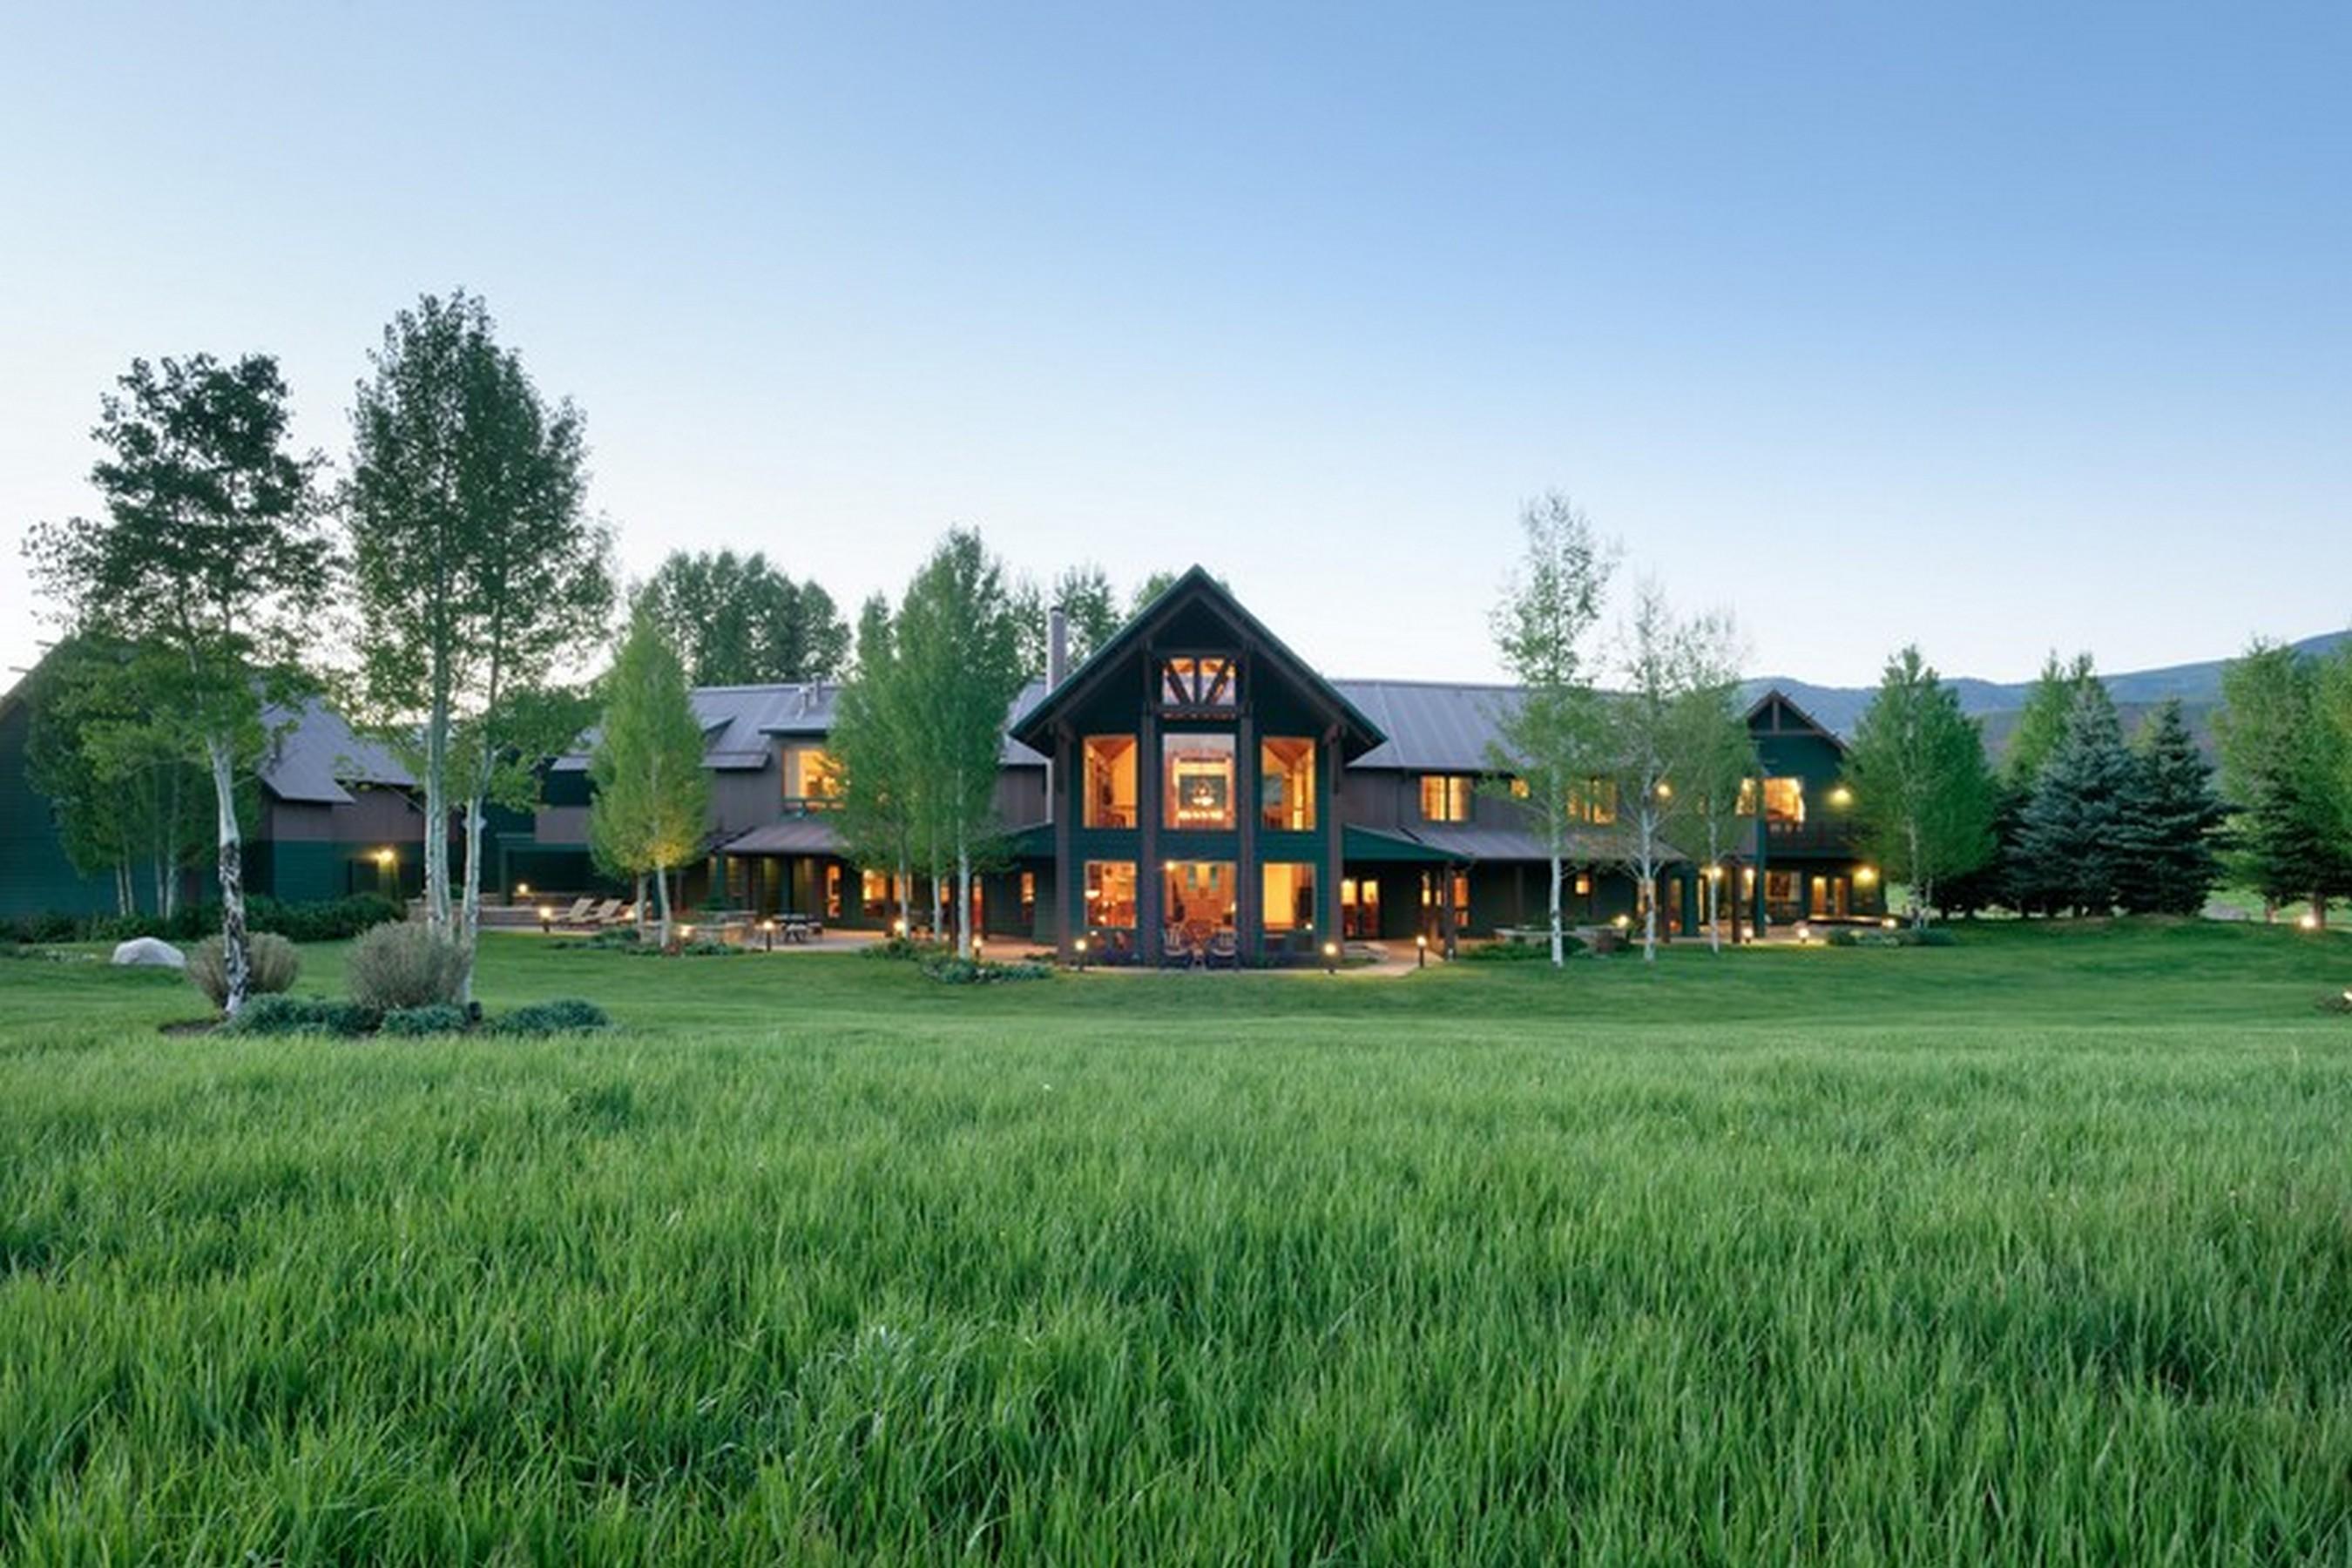 独户住宅 为 销售 在 The Pastoral Life 910 White Star Drive McLain Flats, 阿斯彭, 科罗拉多州, 81611 美国